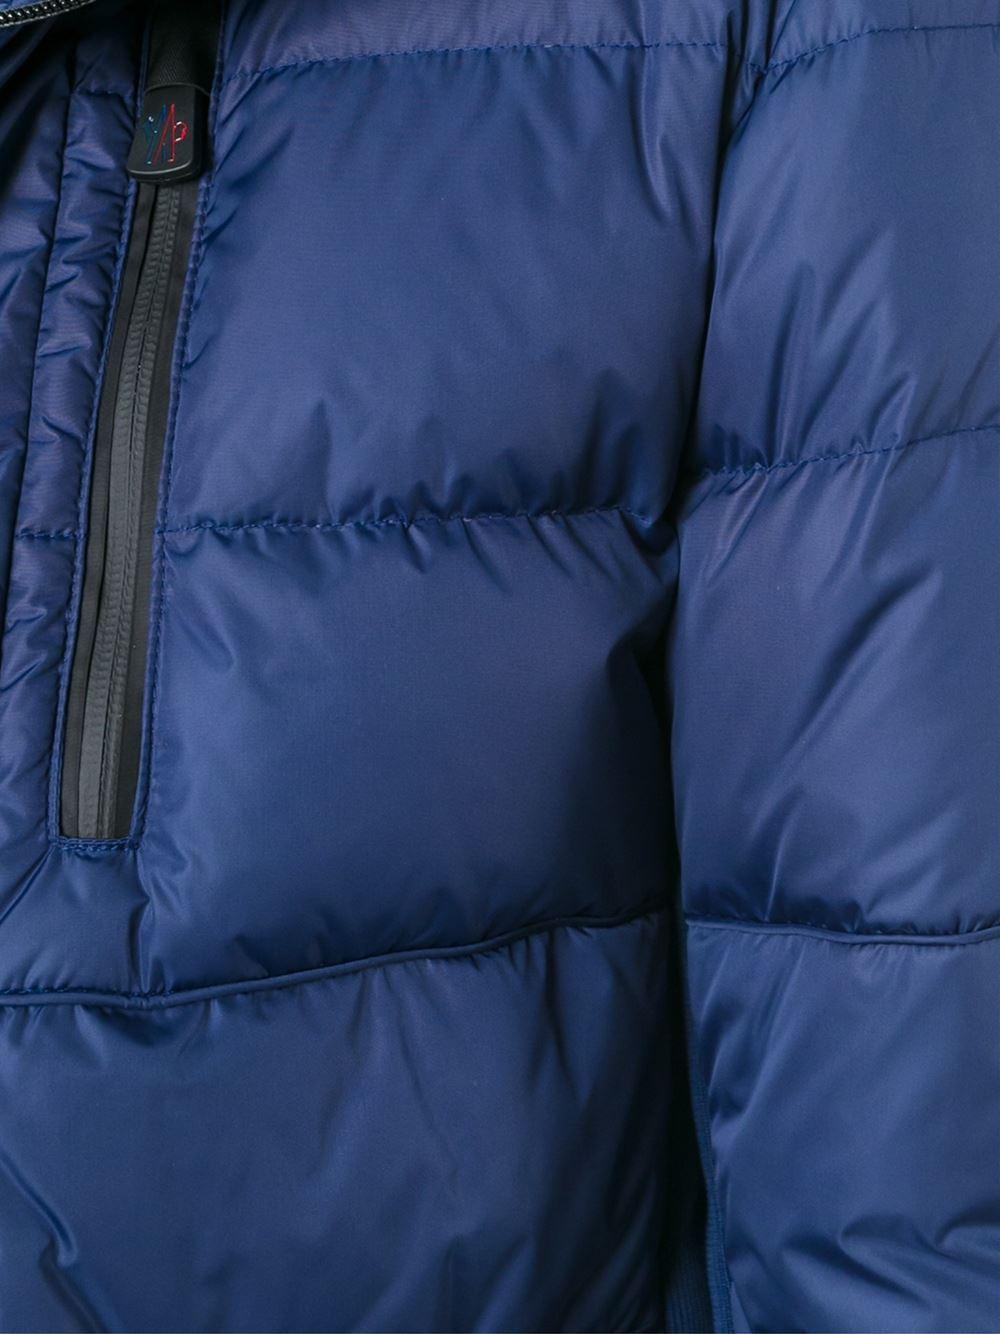 Moncler Soulare Mont Mavi - 100 #Moncler #MonclerSoulare #Mont - 2